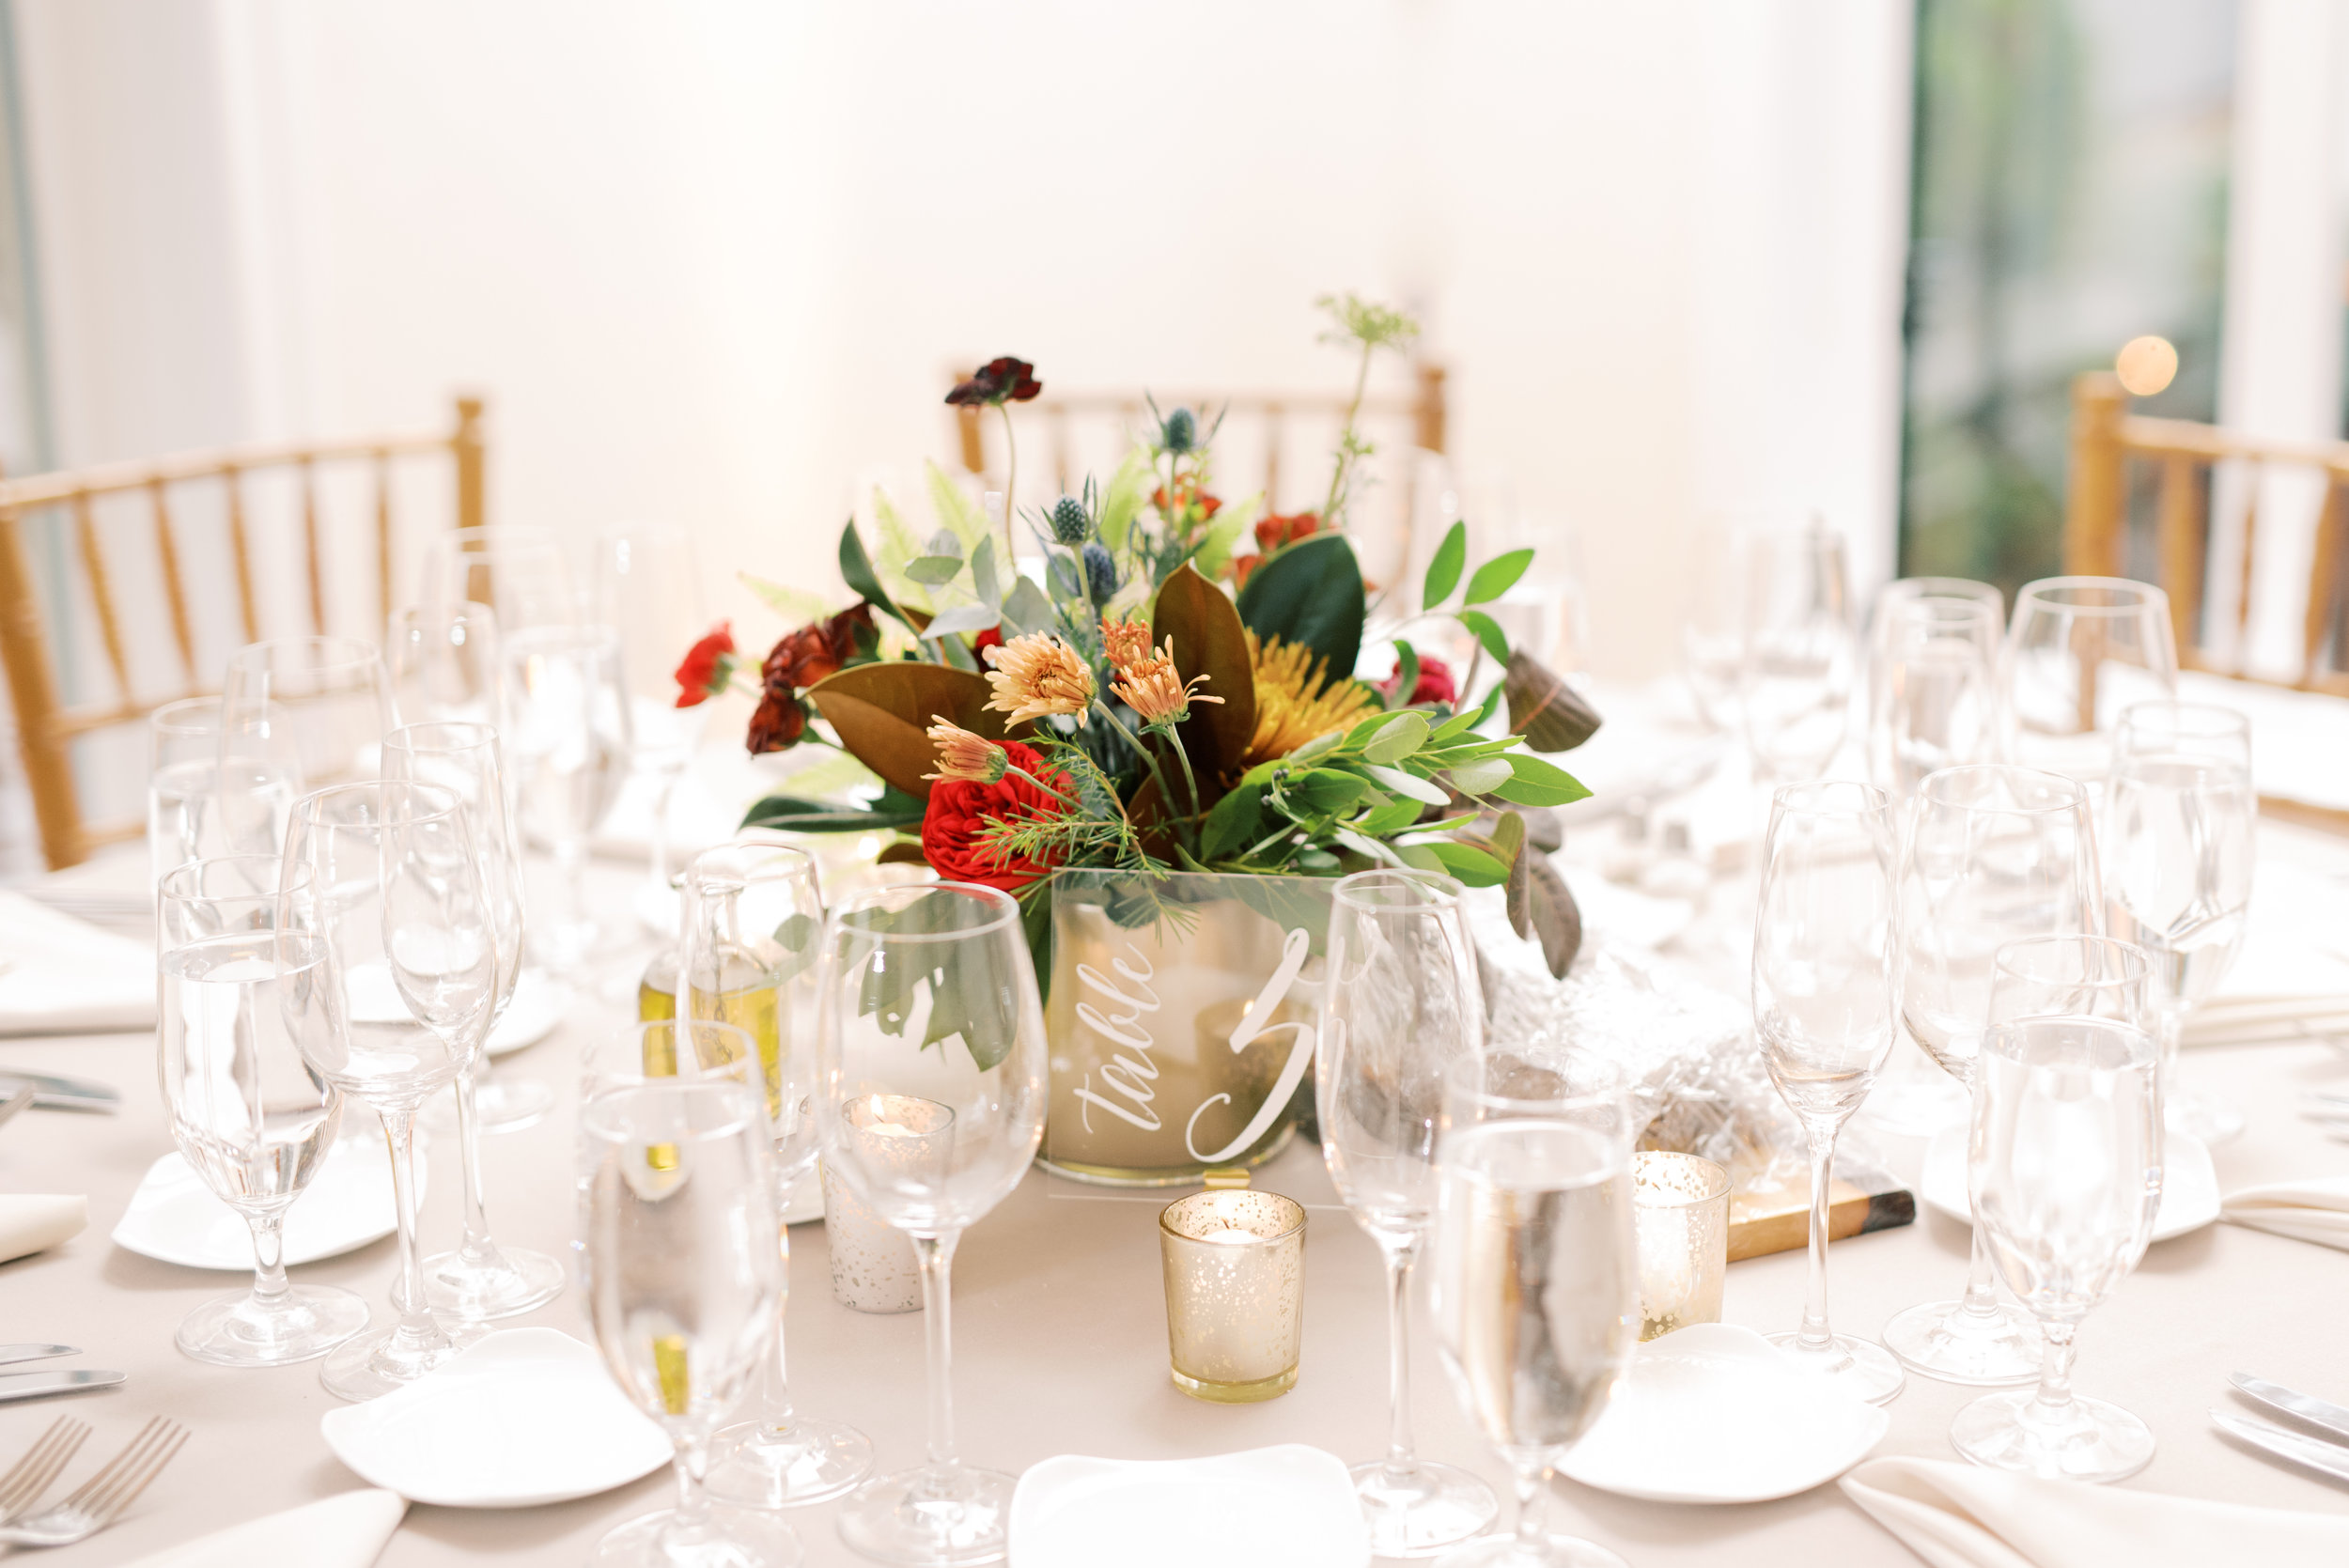 haley-richter-photography-october-pomme-wedding-in-radnor-079.jpg